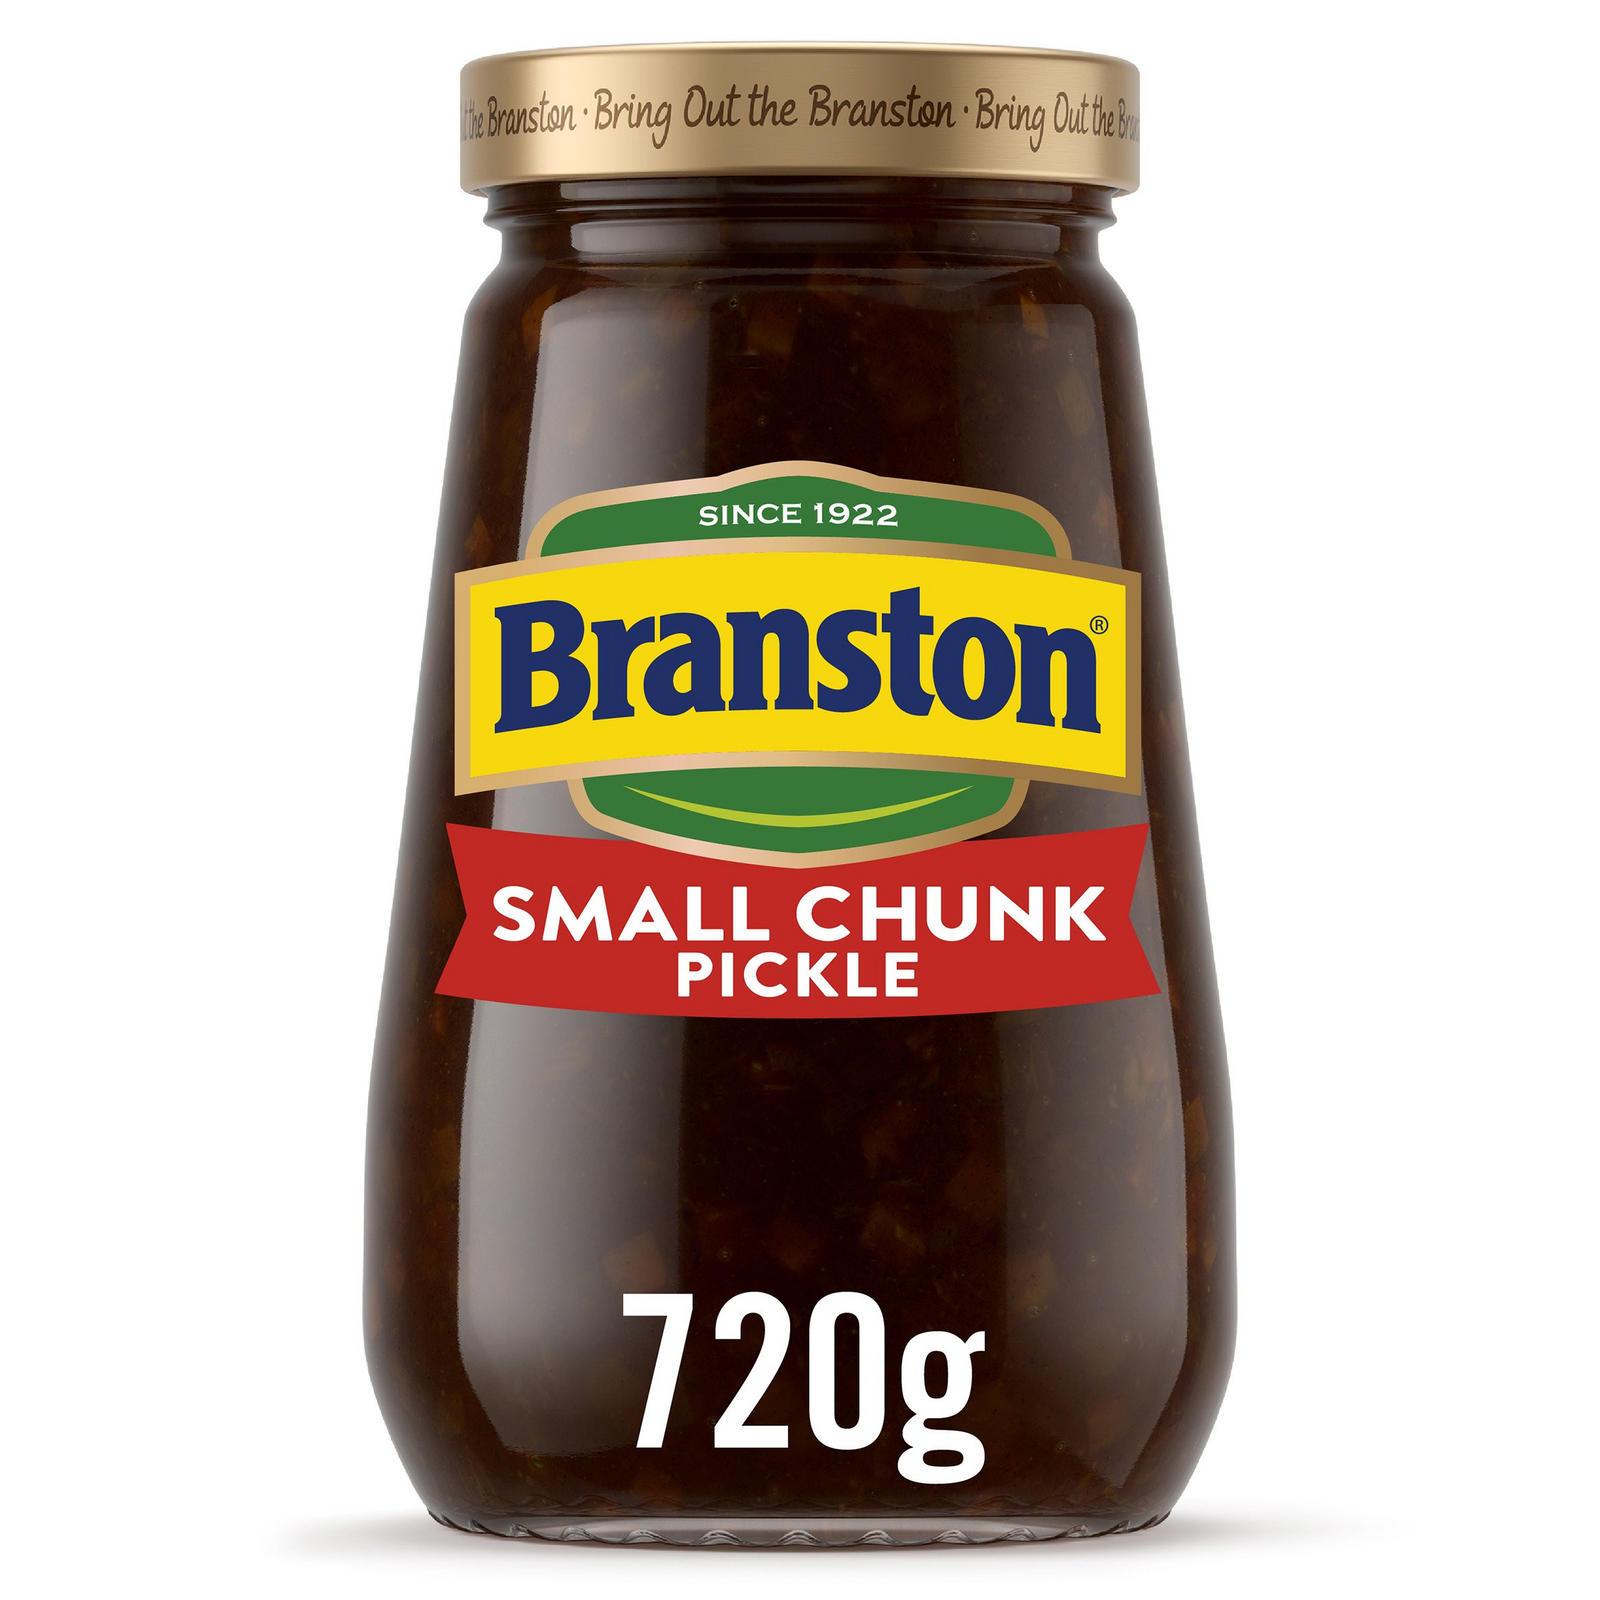 Branston Small Chunk Pickle 720g | Pickles & Chutneys ...